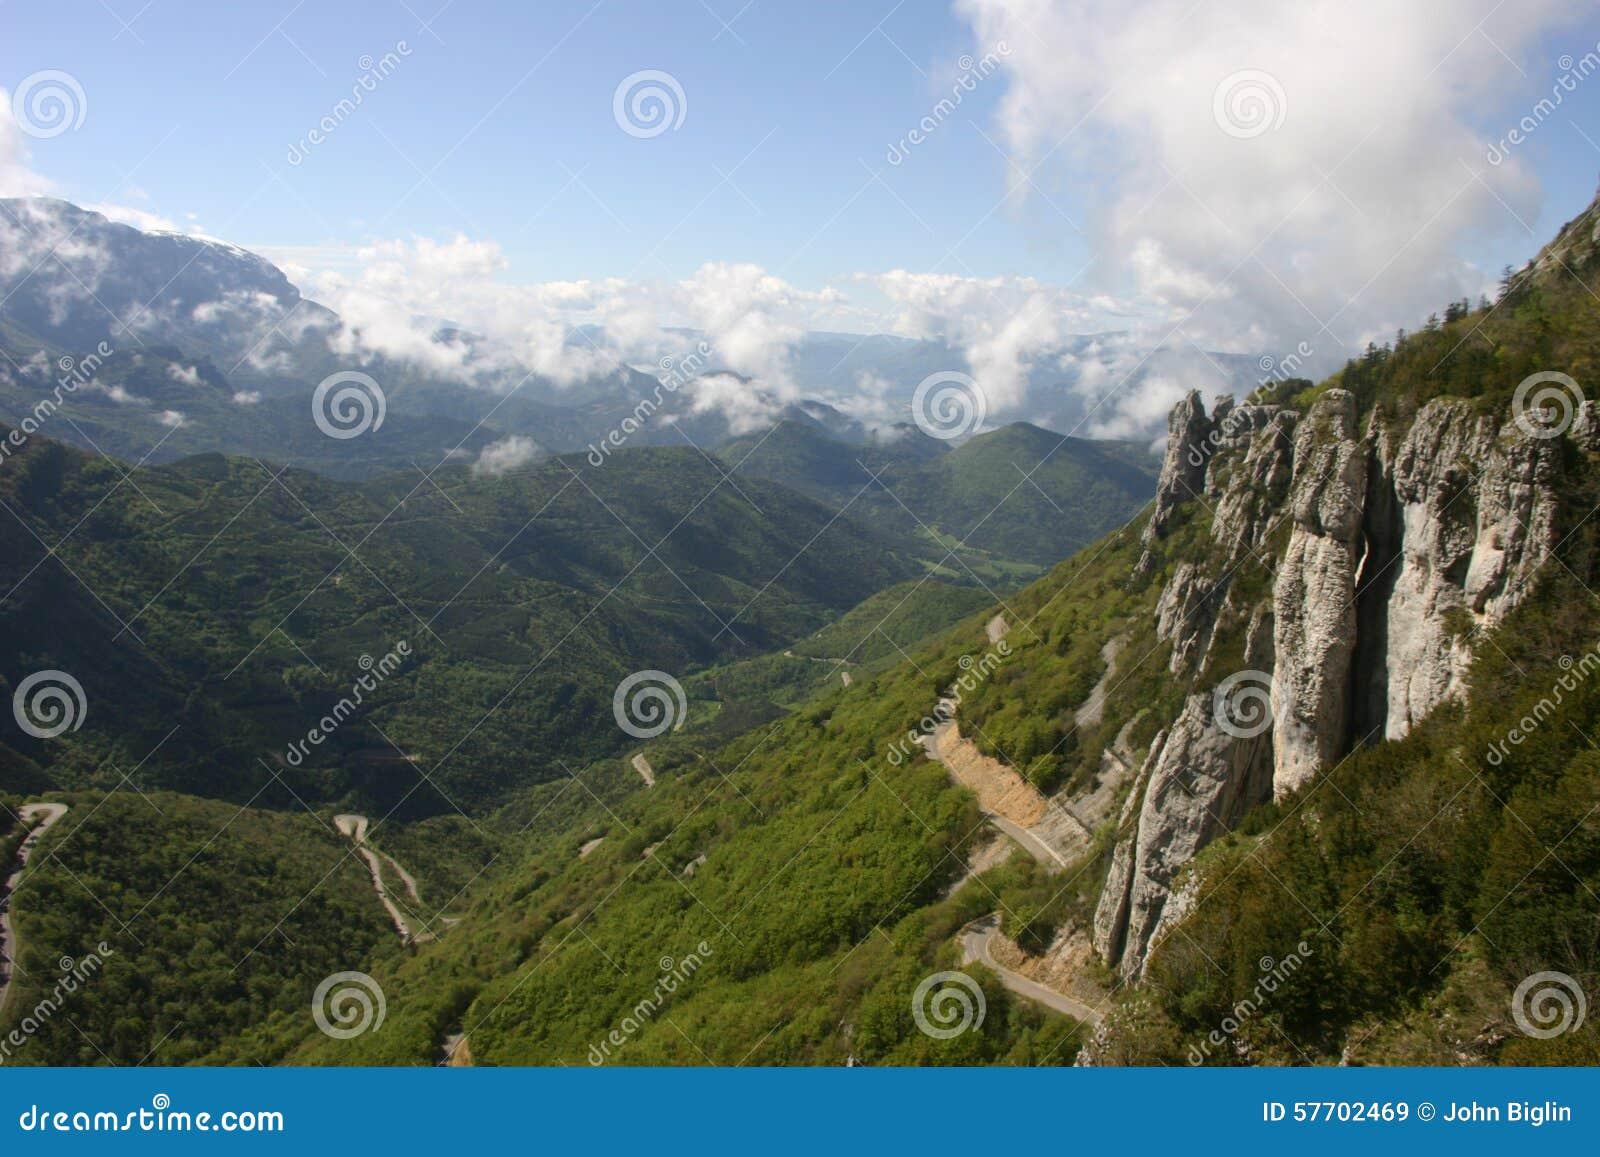 French lower alpine valley